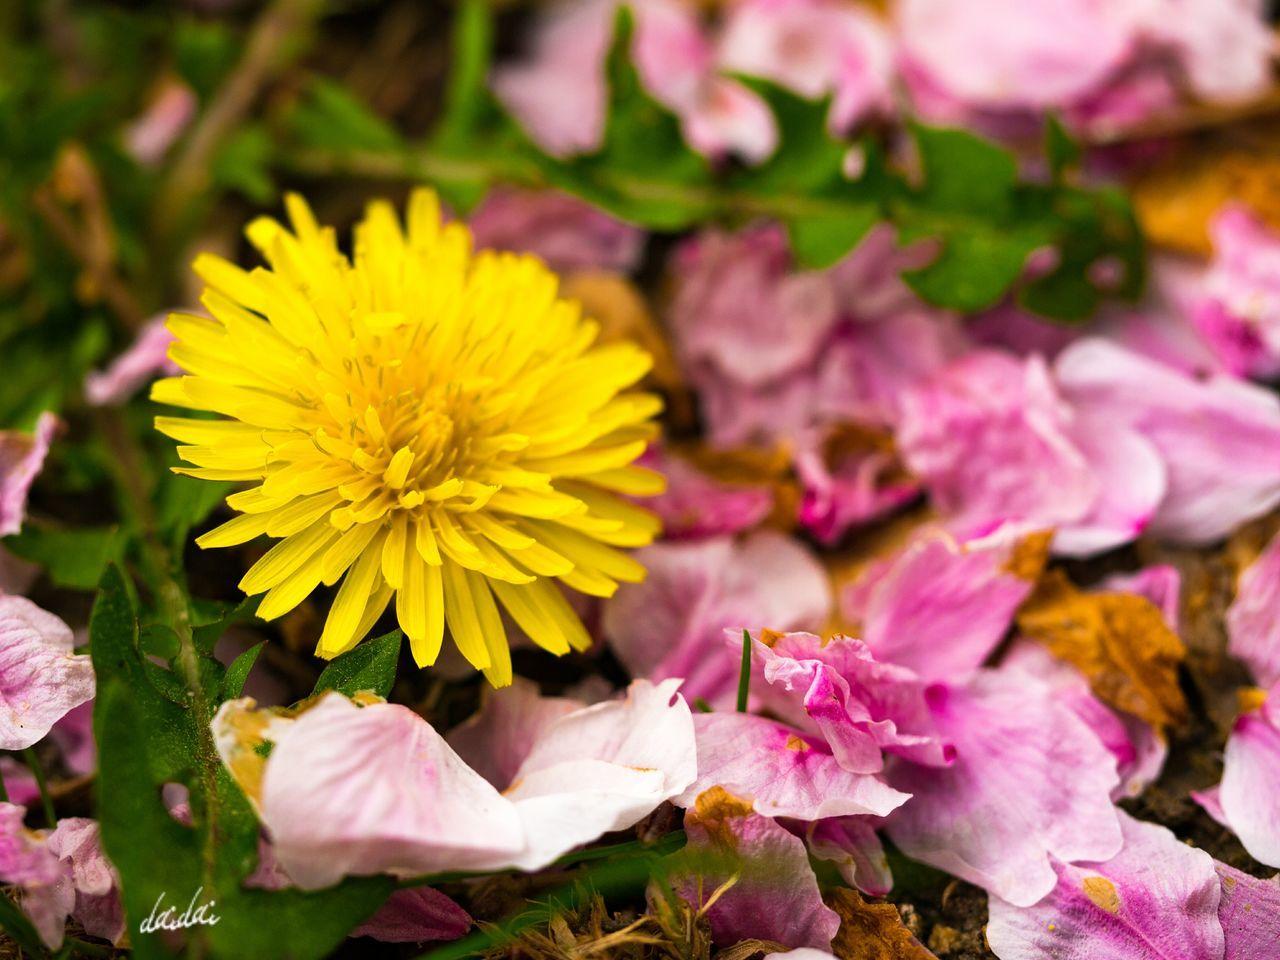 farewell E-PL3 Fukuokadeeps 海の中道海浜公園 Flower 花 RAW 編集 桜 Cherry Blossoms 蒲公英 Dandelion